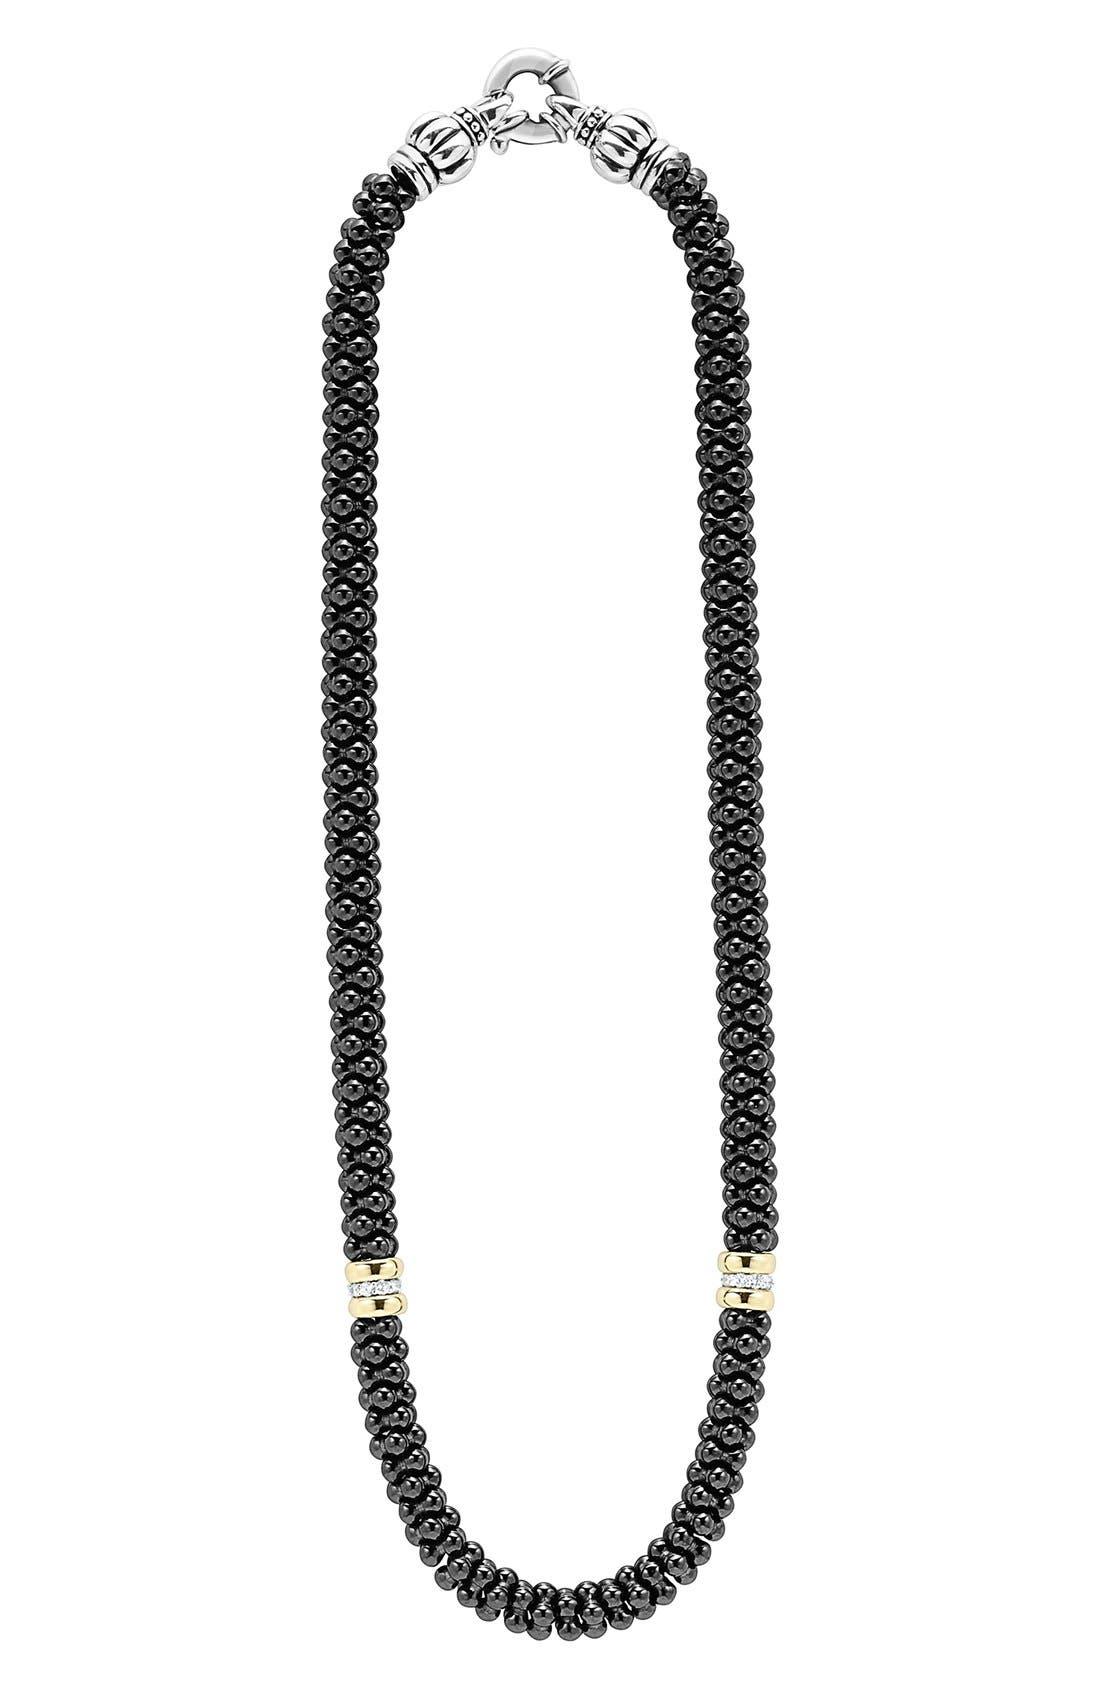 'Black Caviar' 7mm Beaded Diamond Station Necklace,                         Main,                         color, BLACK CAVIAR/ GOLD